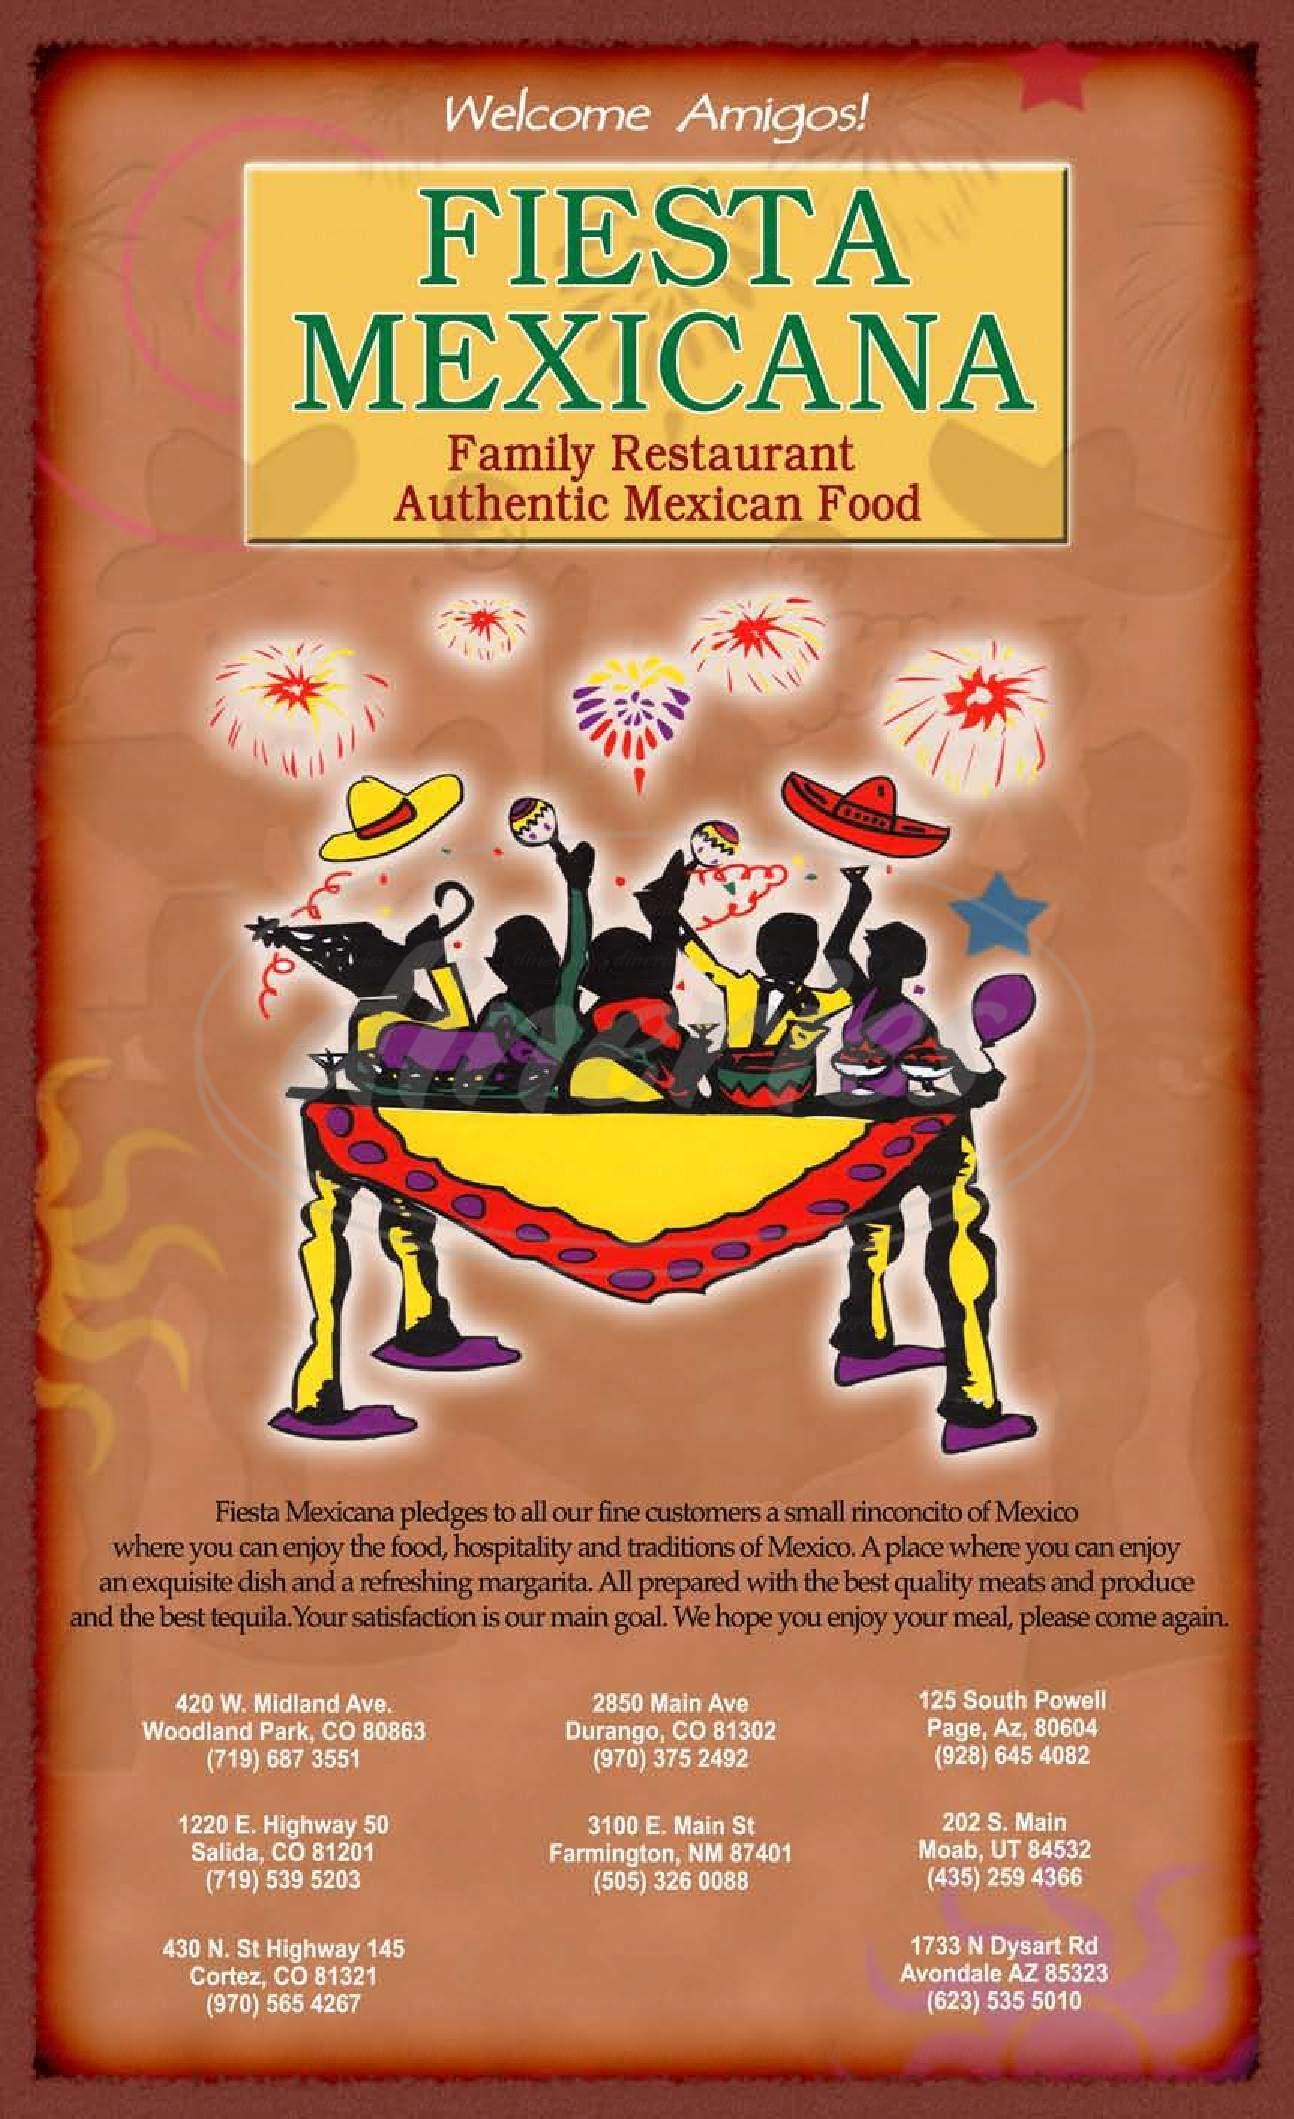 menu for Fiesta Mexicana Family